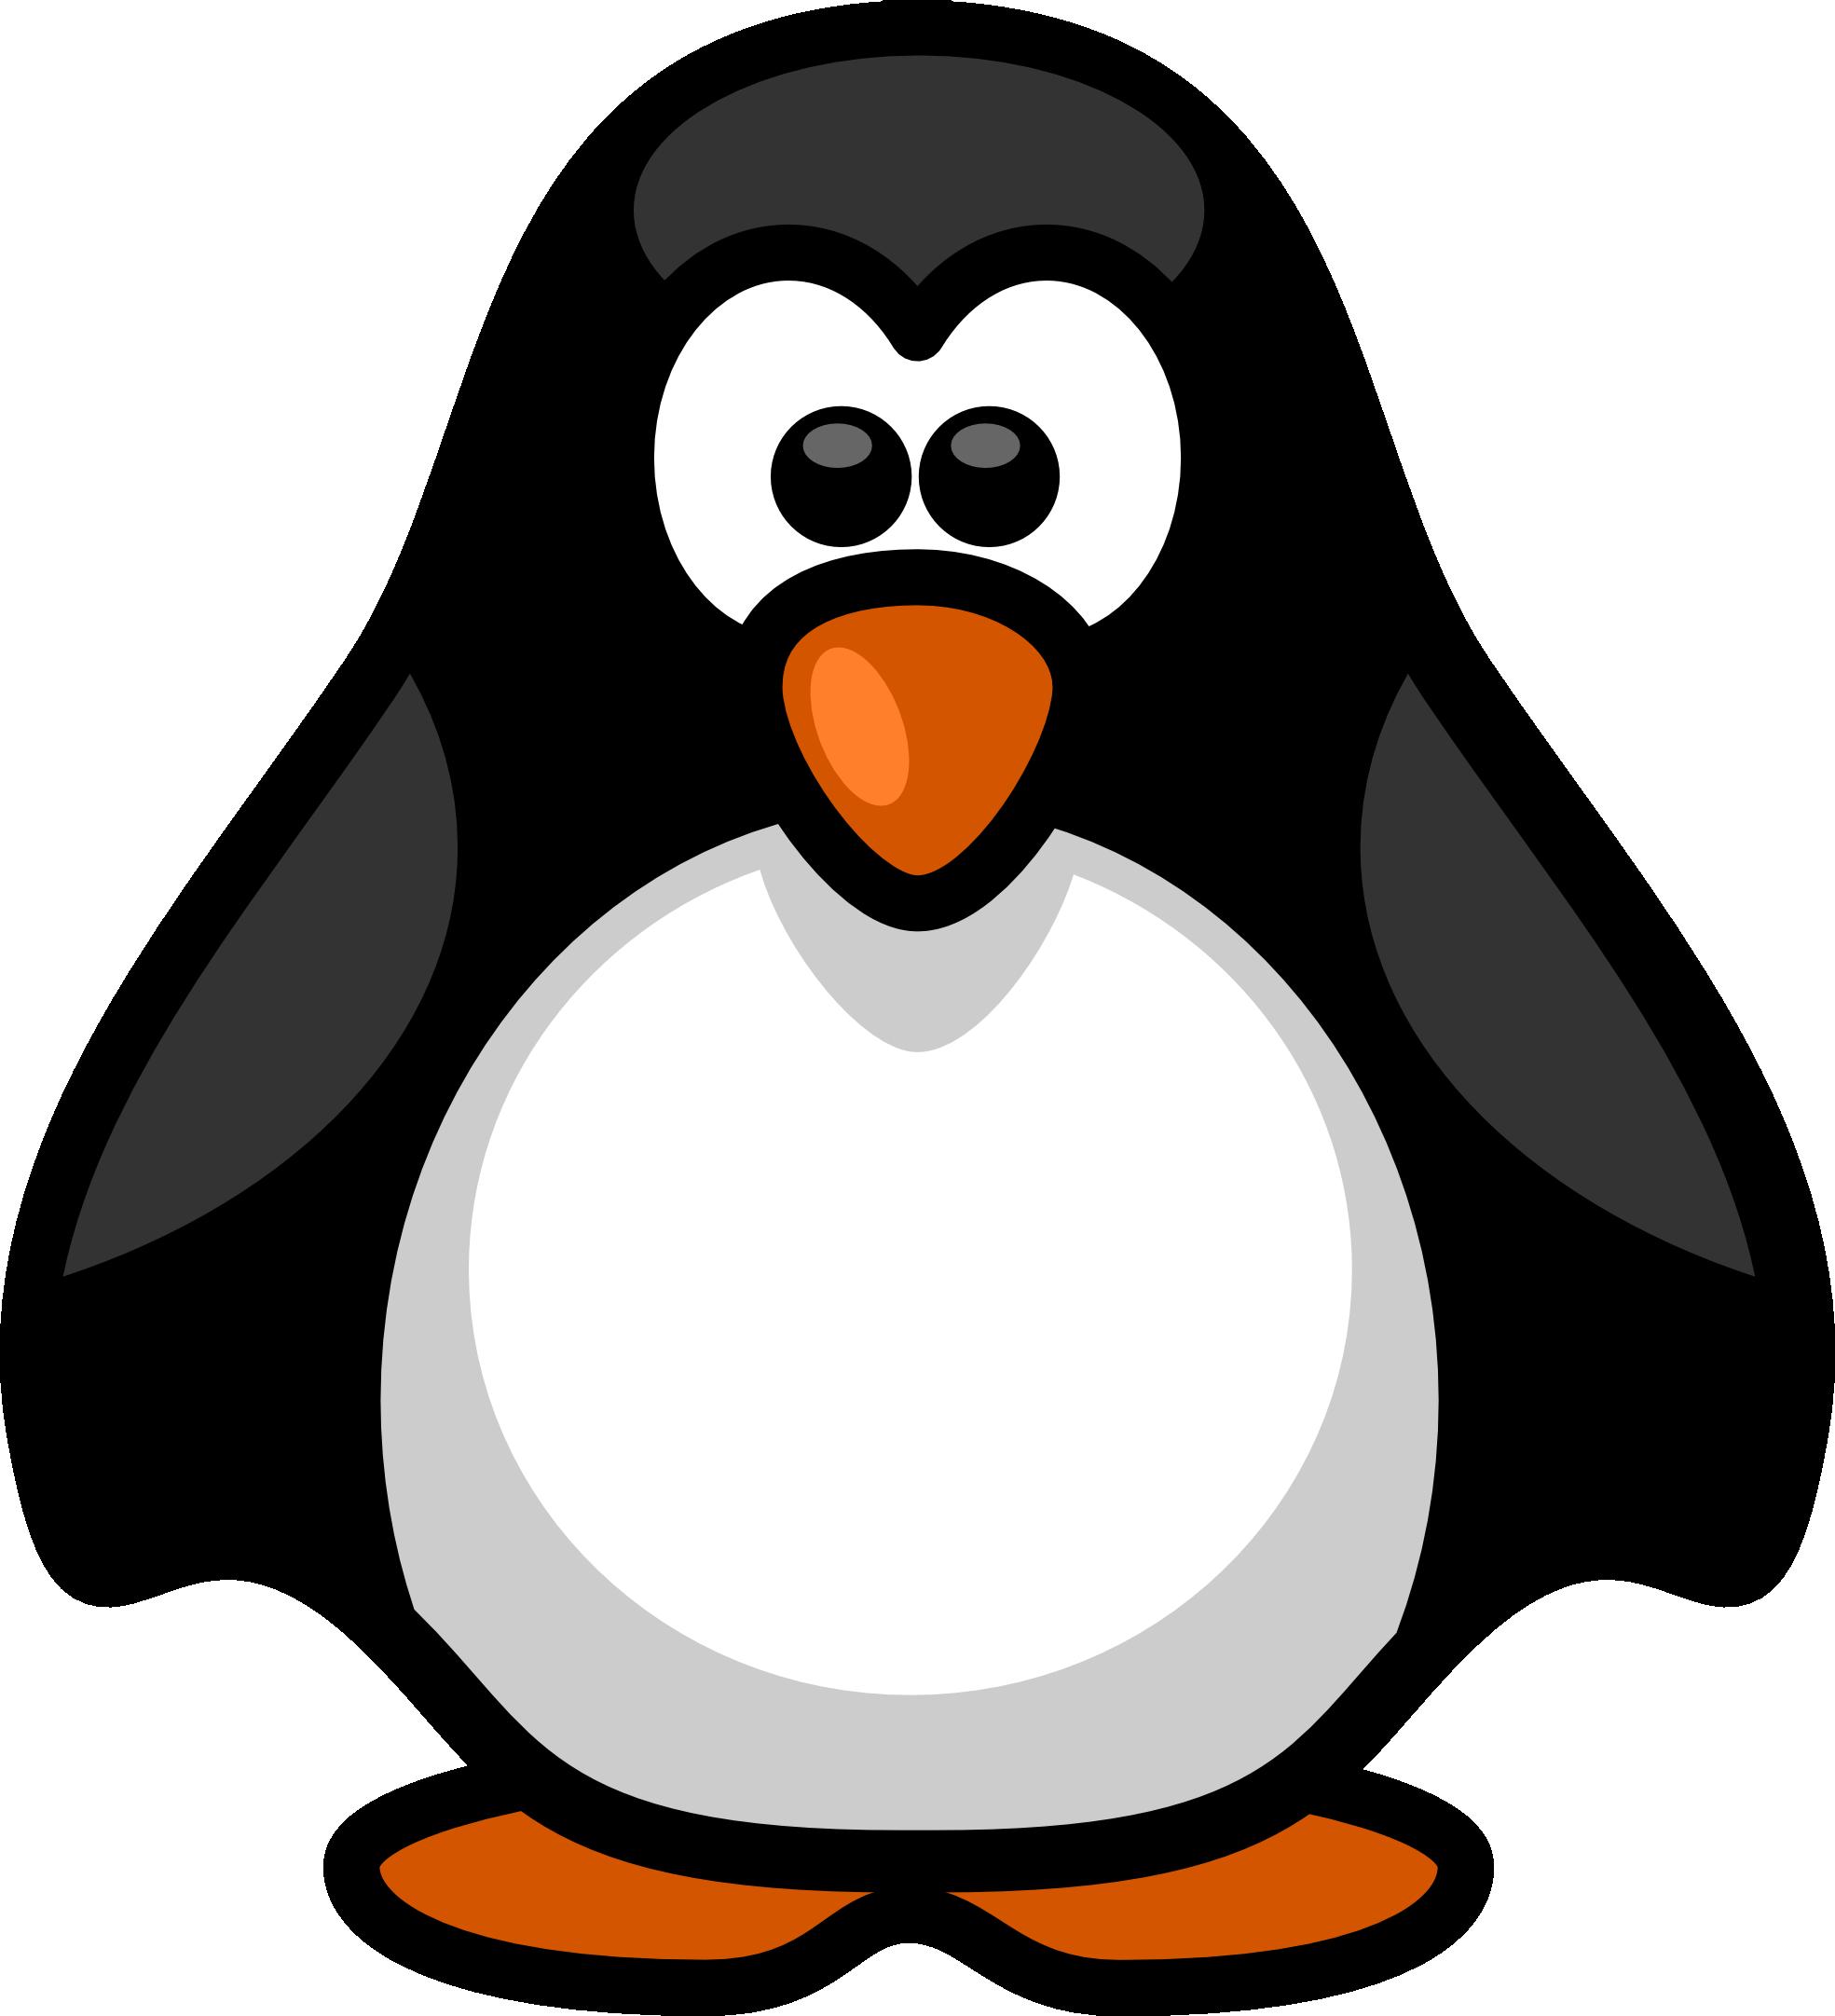 Penguins clipart banner Best Penguin Clip Art #2701 - Clipartion.com banner